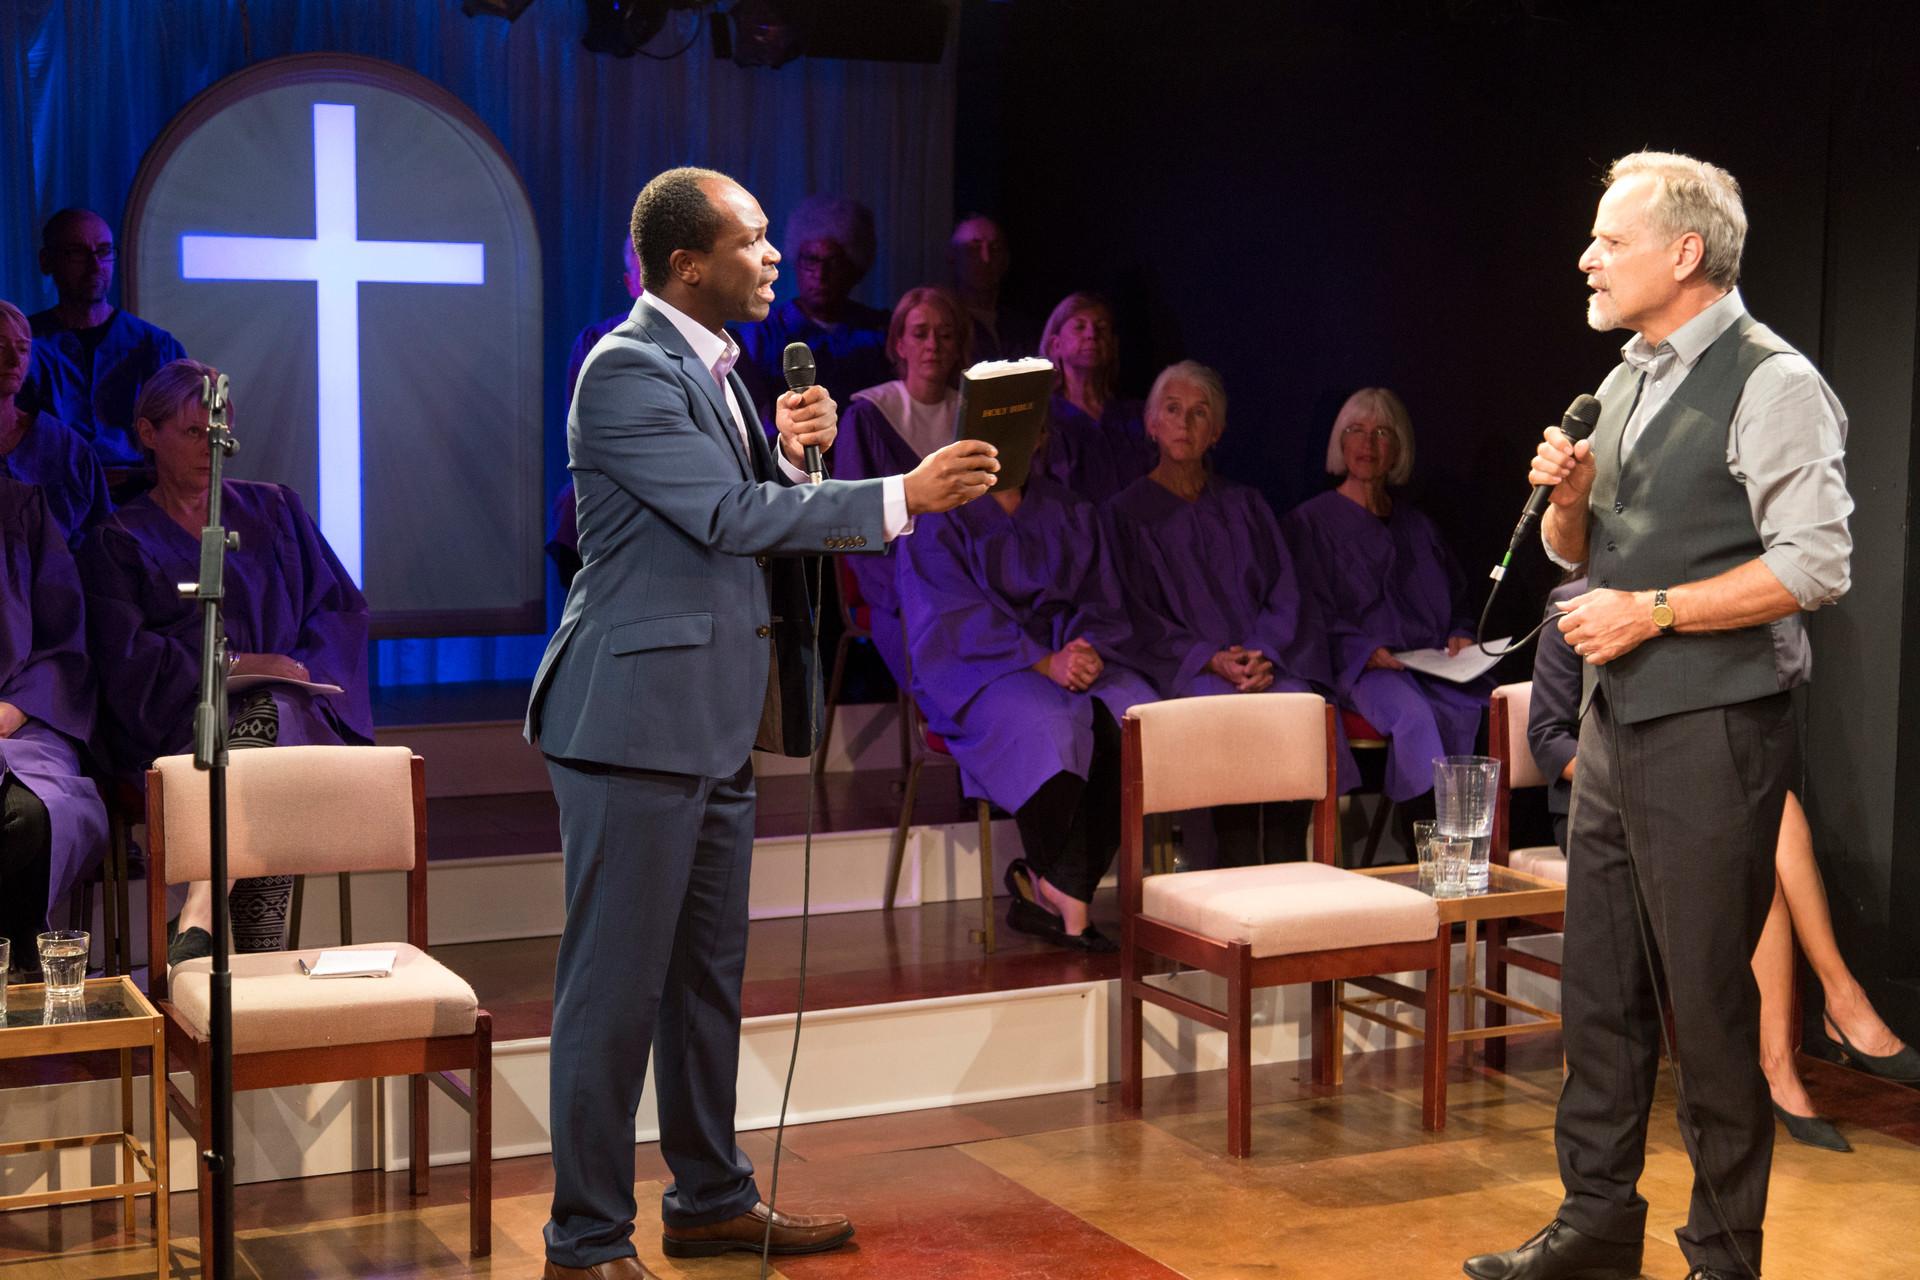 13The Christians_Gate Theatre_ Simon Dutso